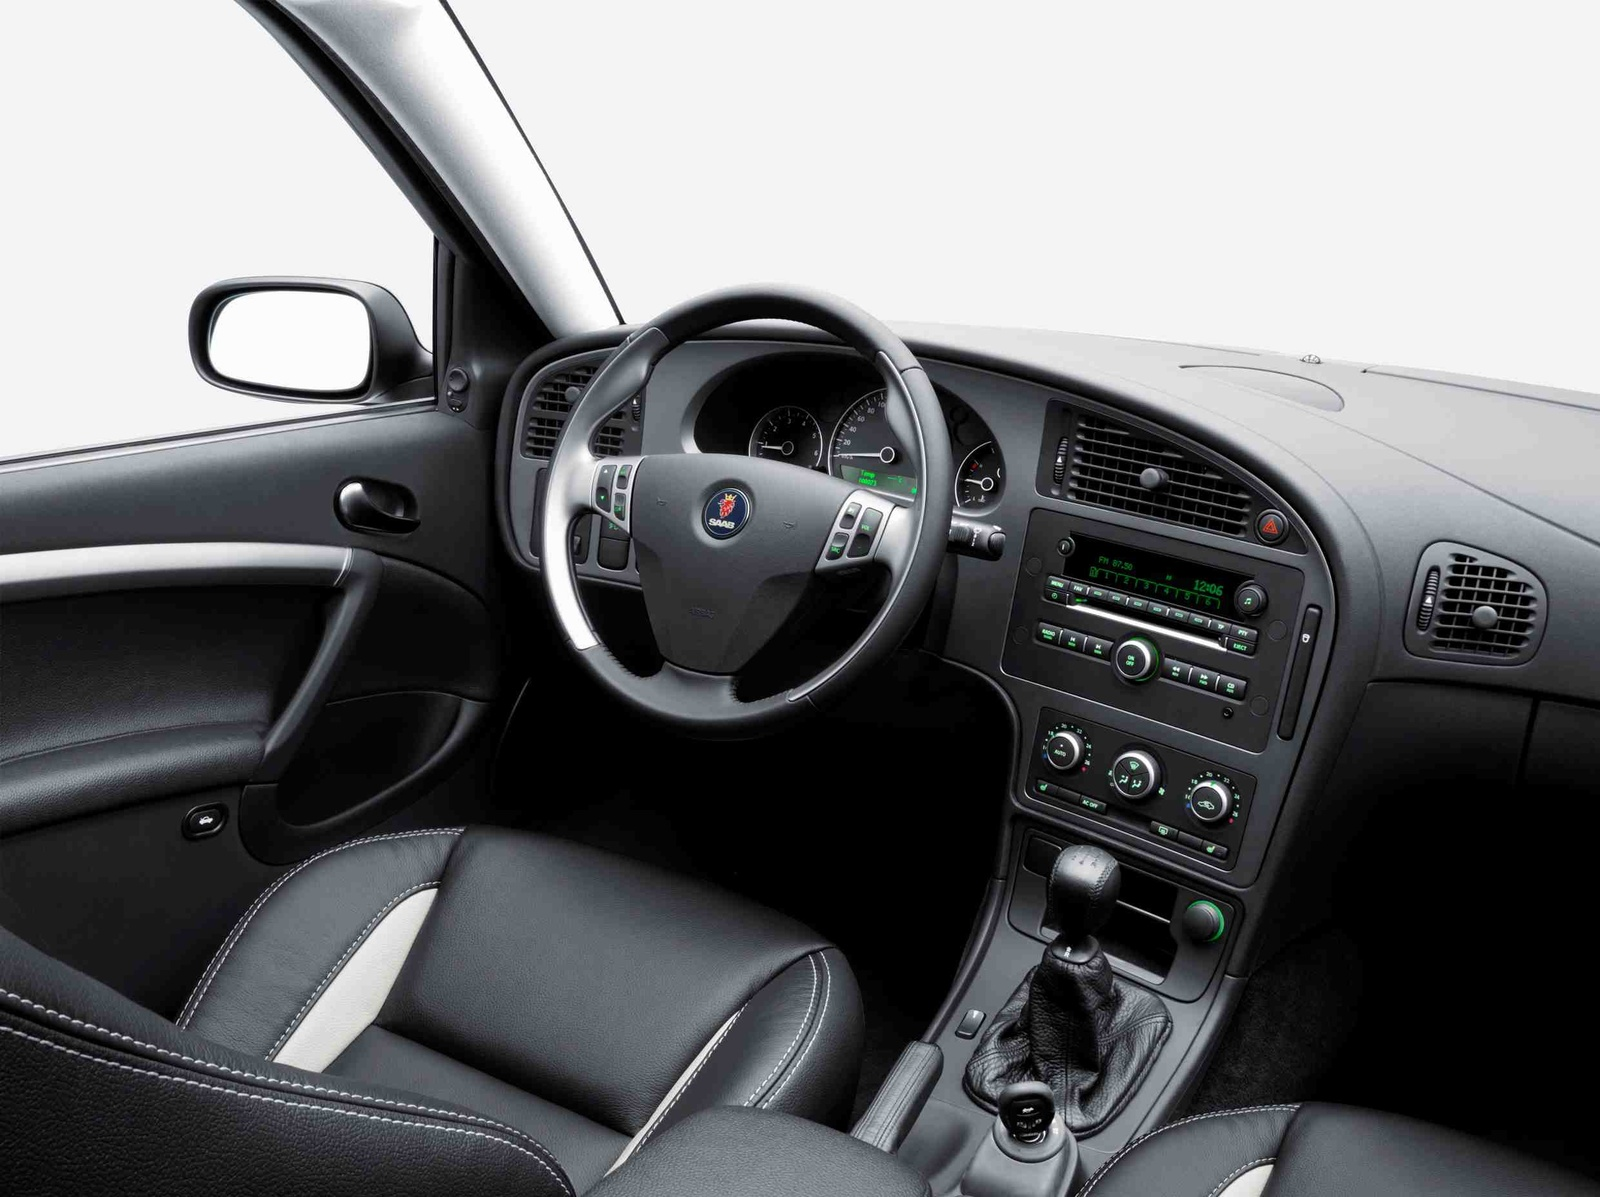 Saab Sportcombi Pic on 2000 Volvo S70 Interior